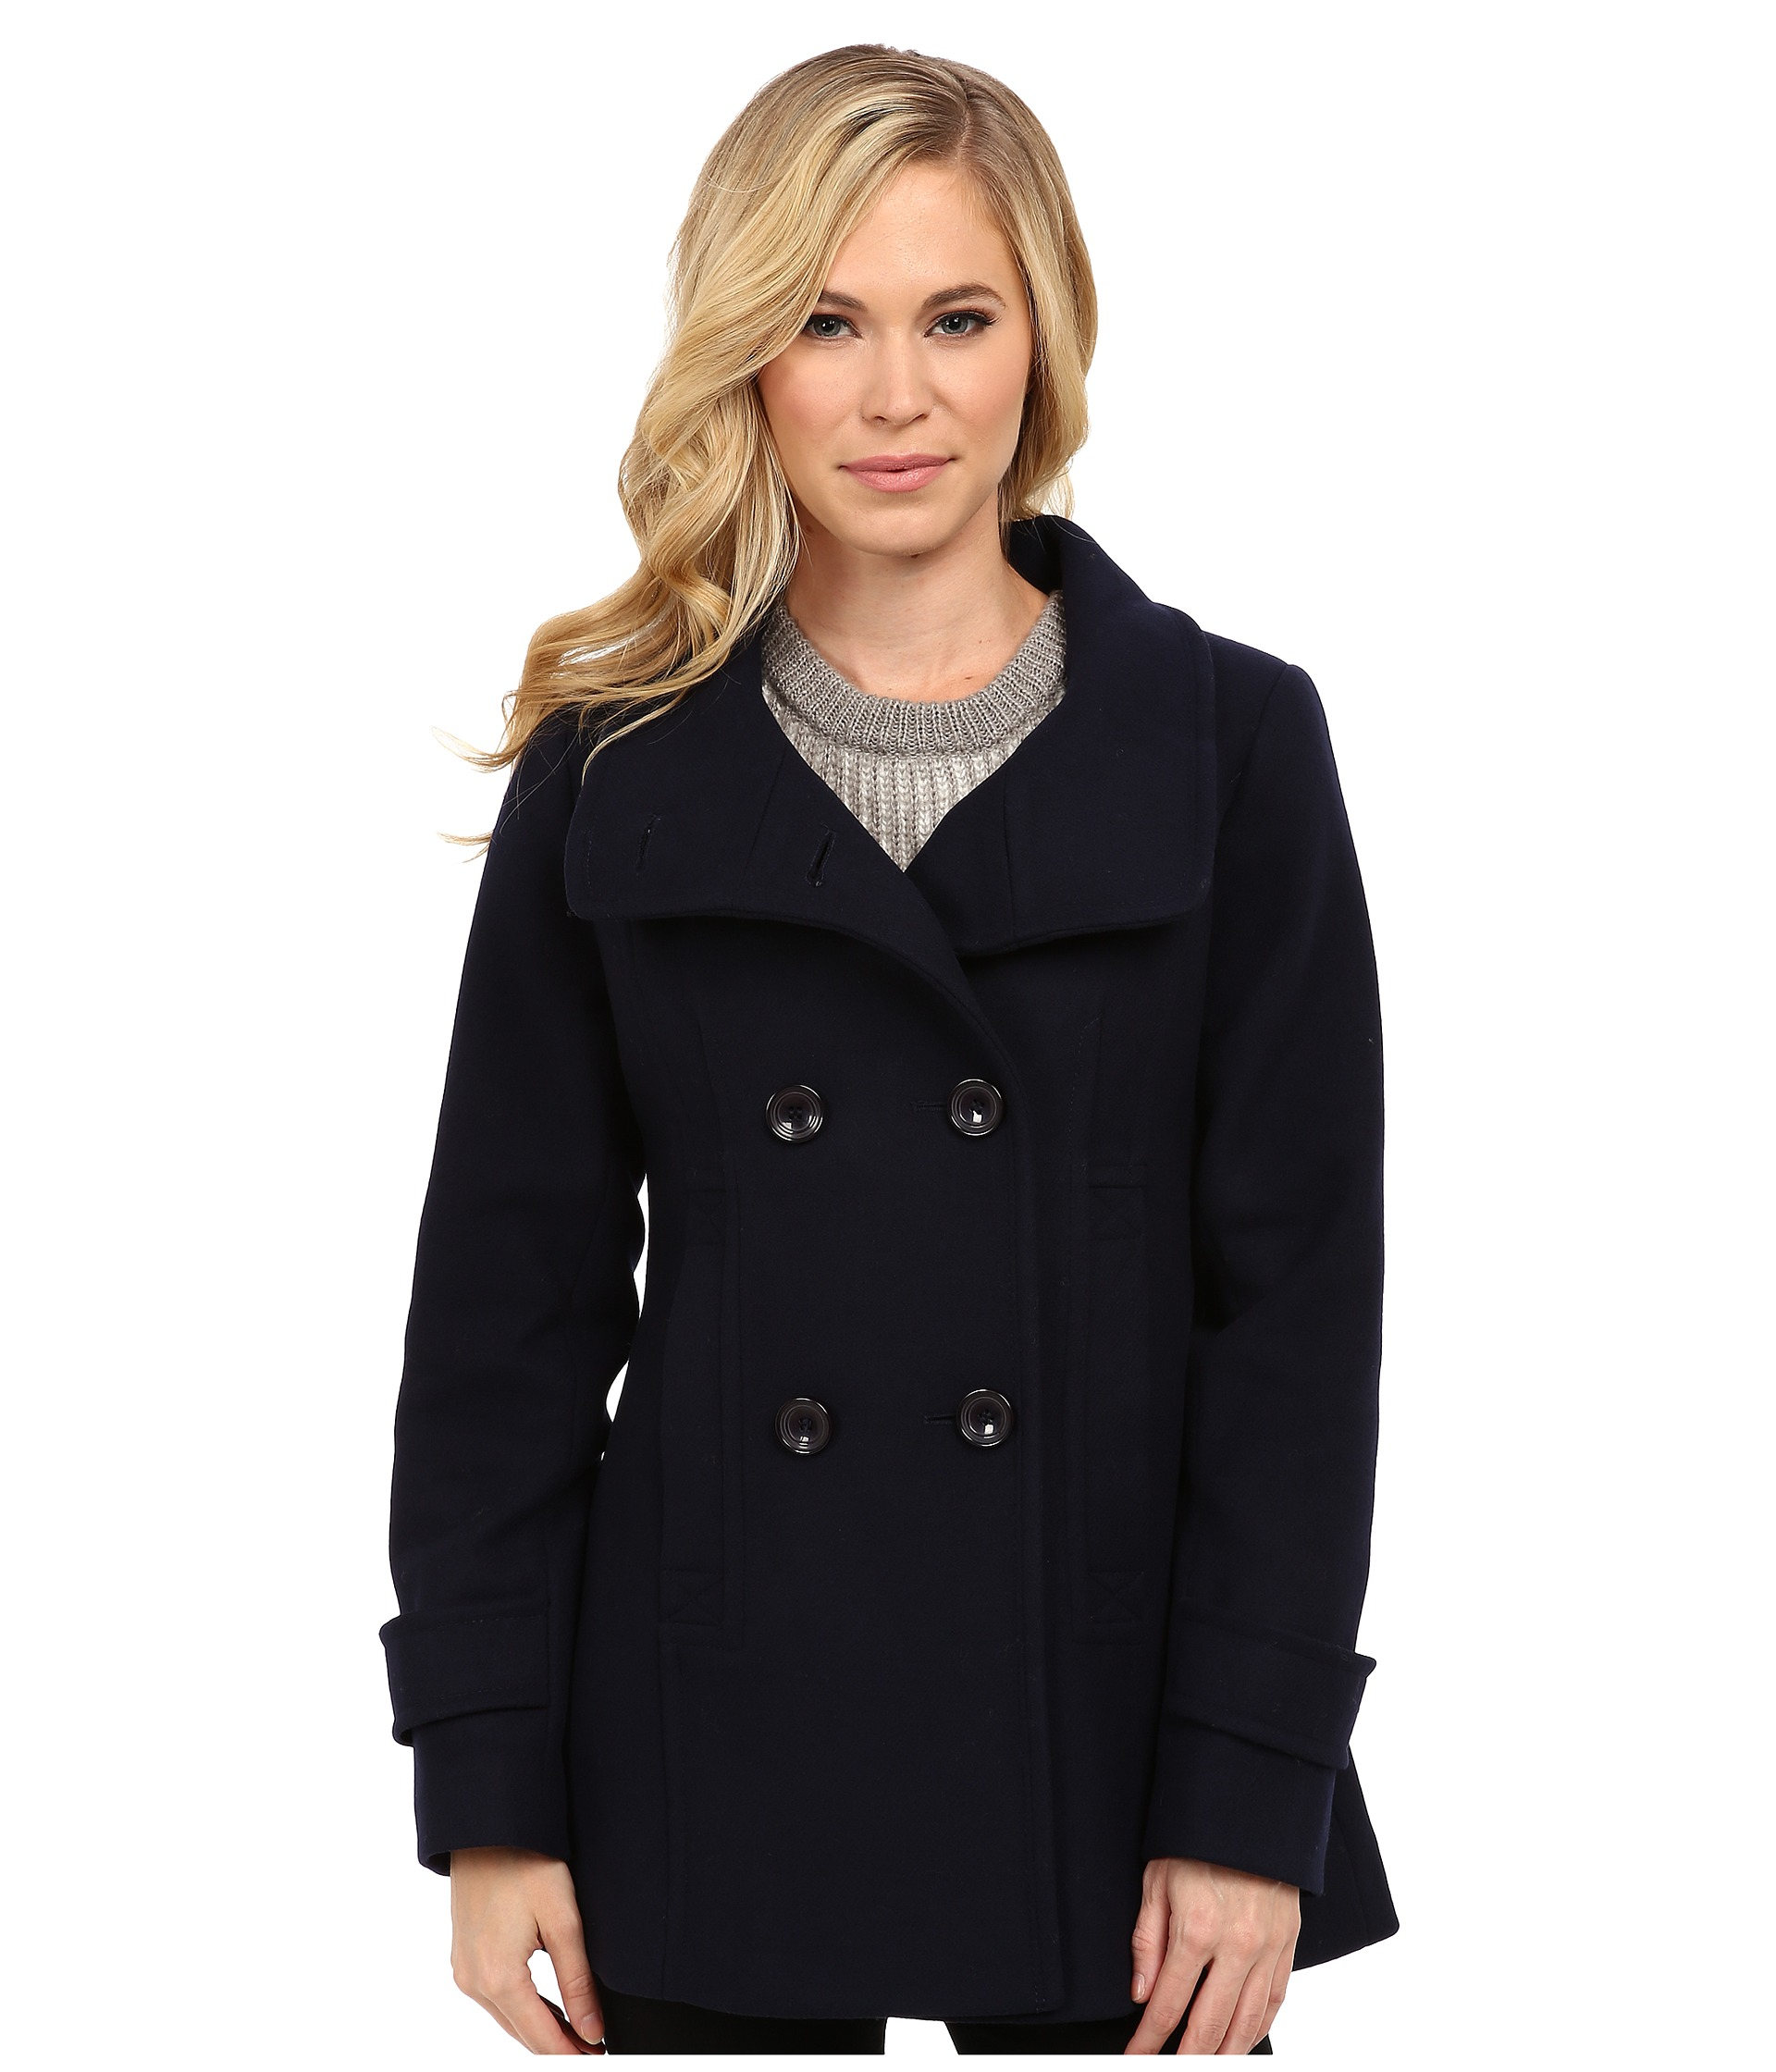 Pendleton Petite Pea Coat